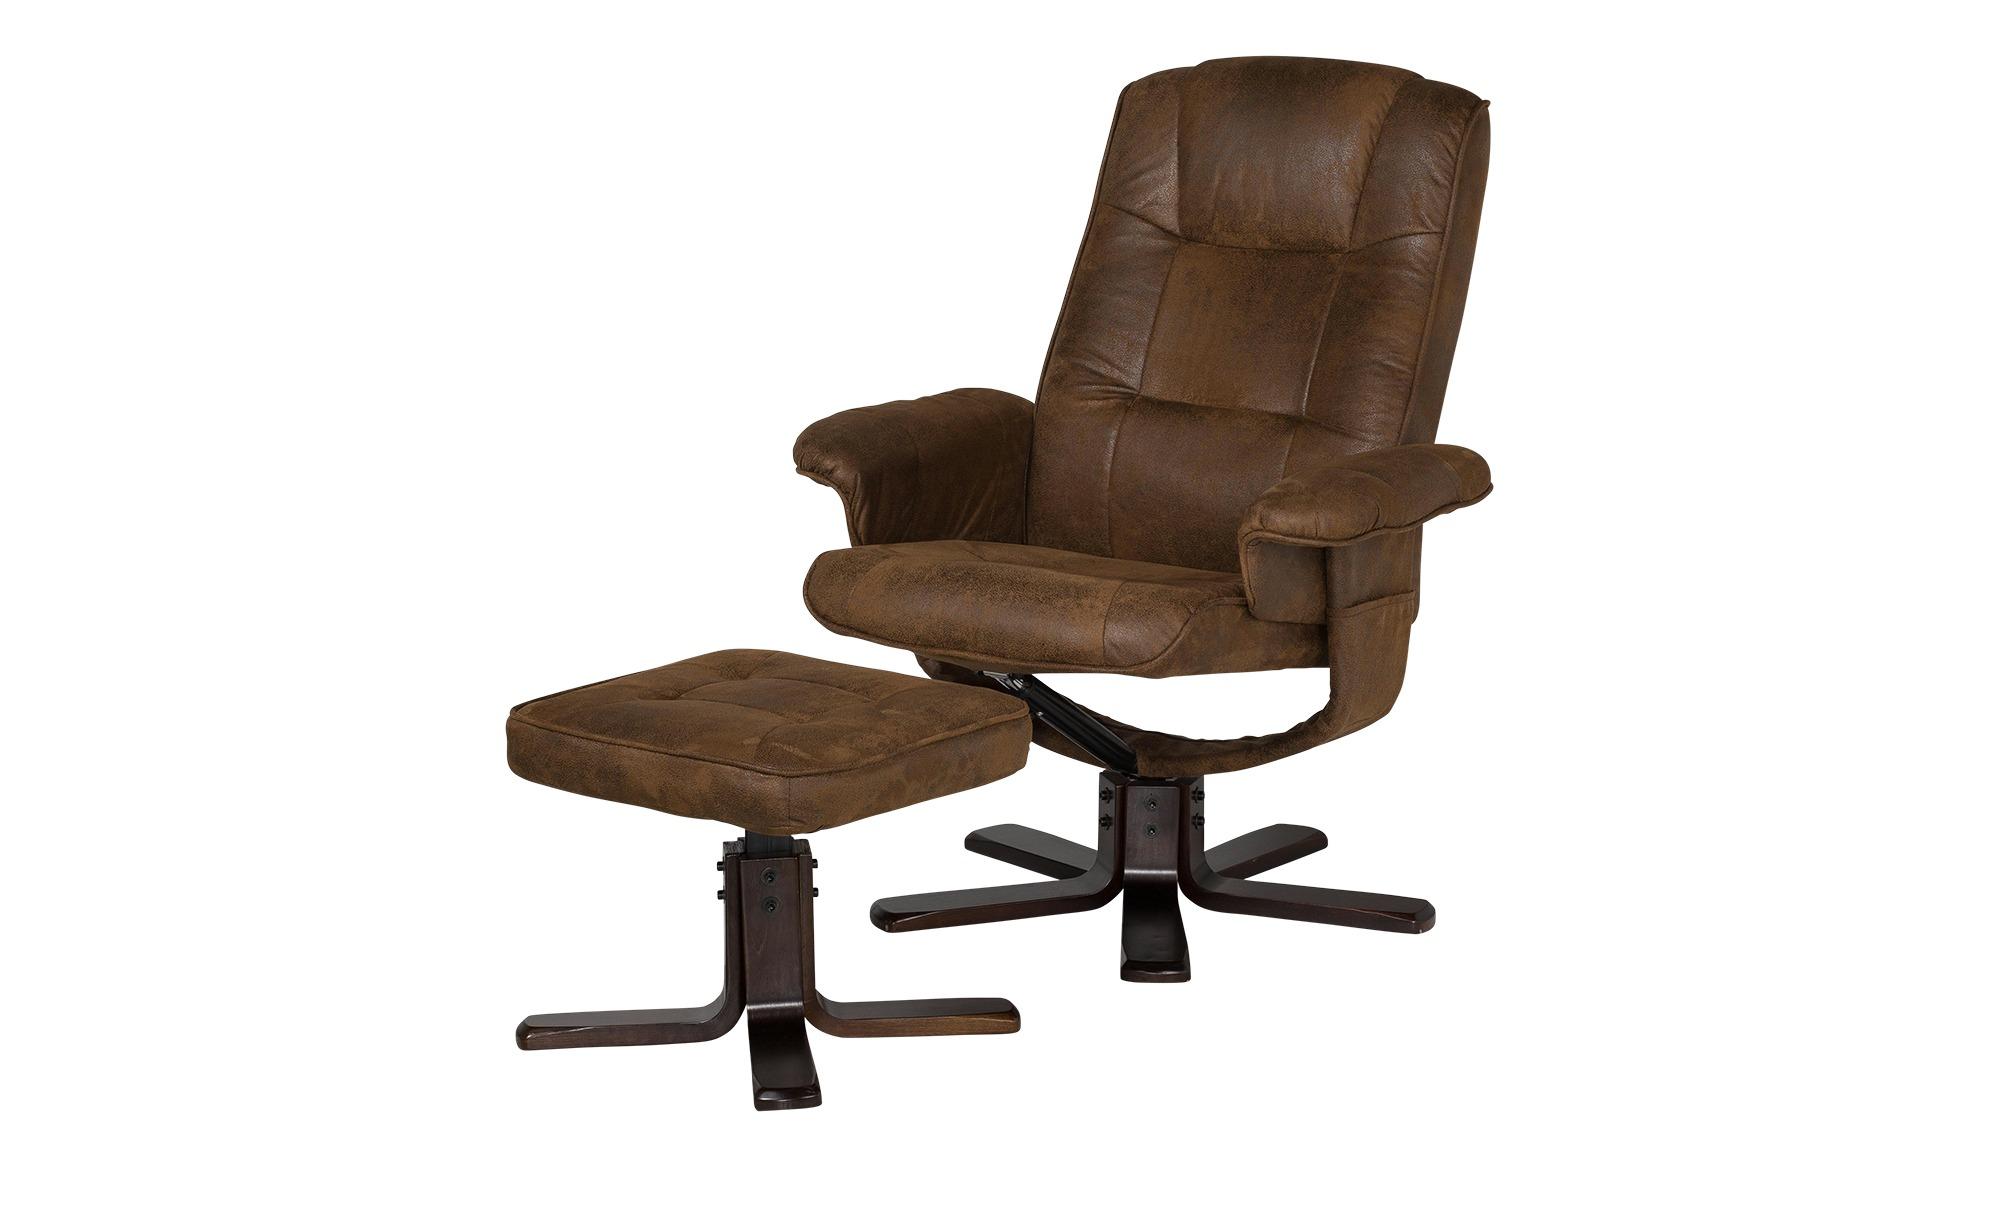 uno Sessel mit Hocker braun - Stoff Alyssa ¦ braun Polstermöbel > Sessel > Polstersessel - Höffner